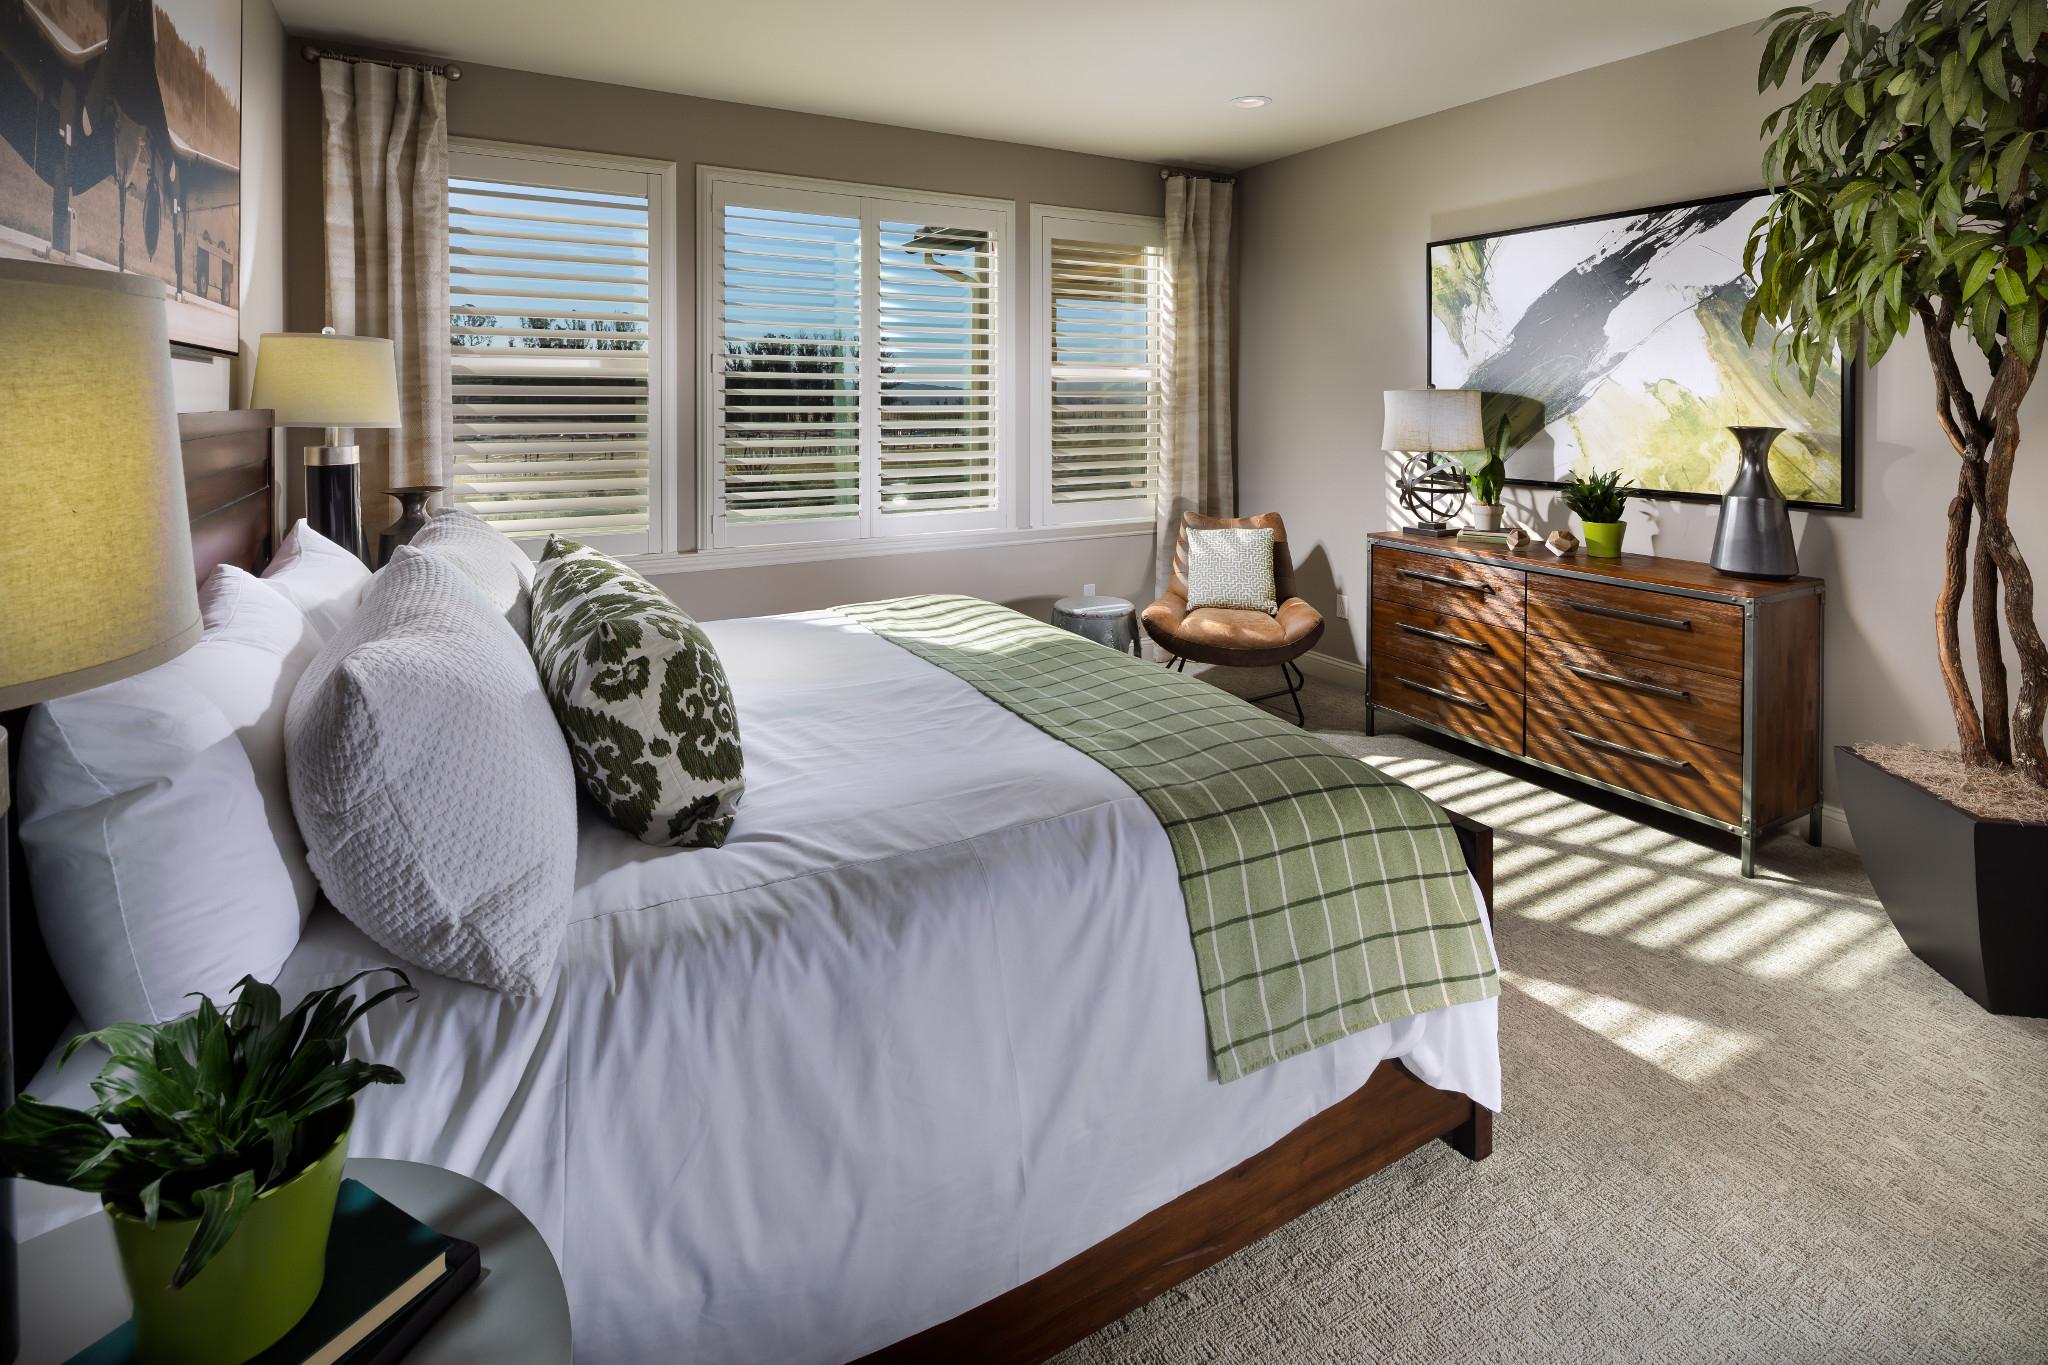 Trilogy Monarch Dunes Ojai Master Bedroom